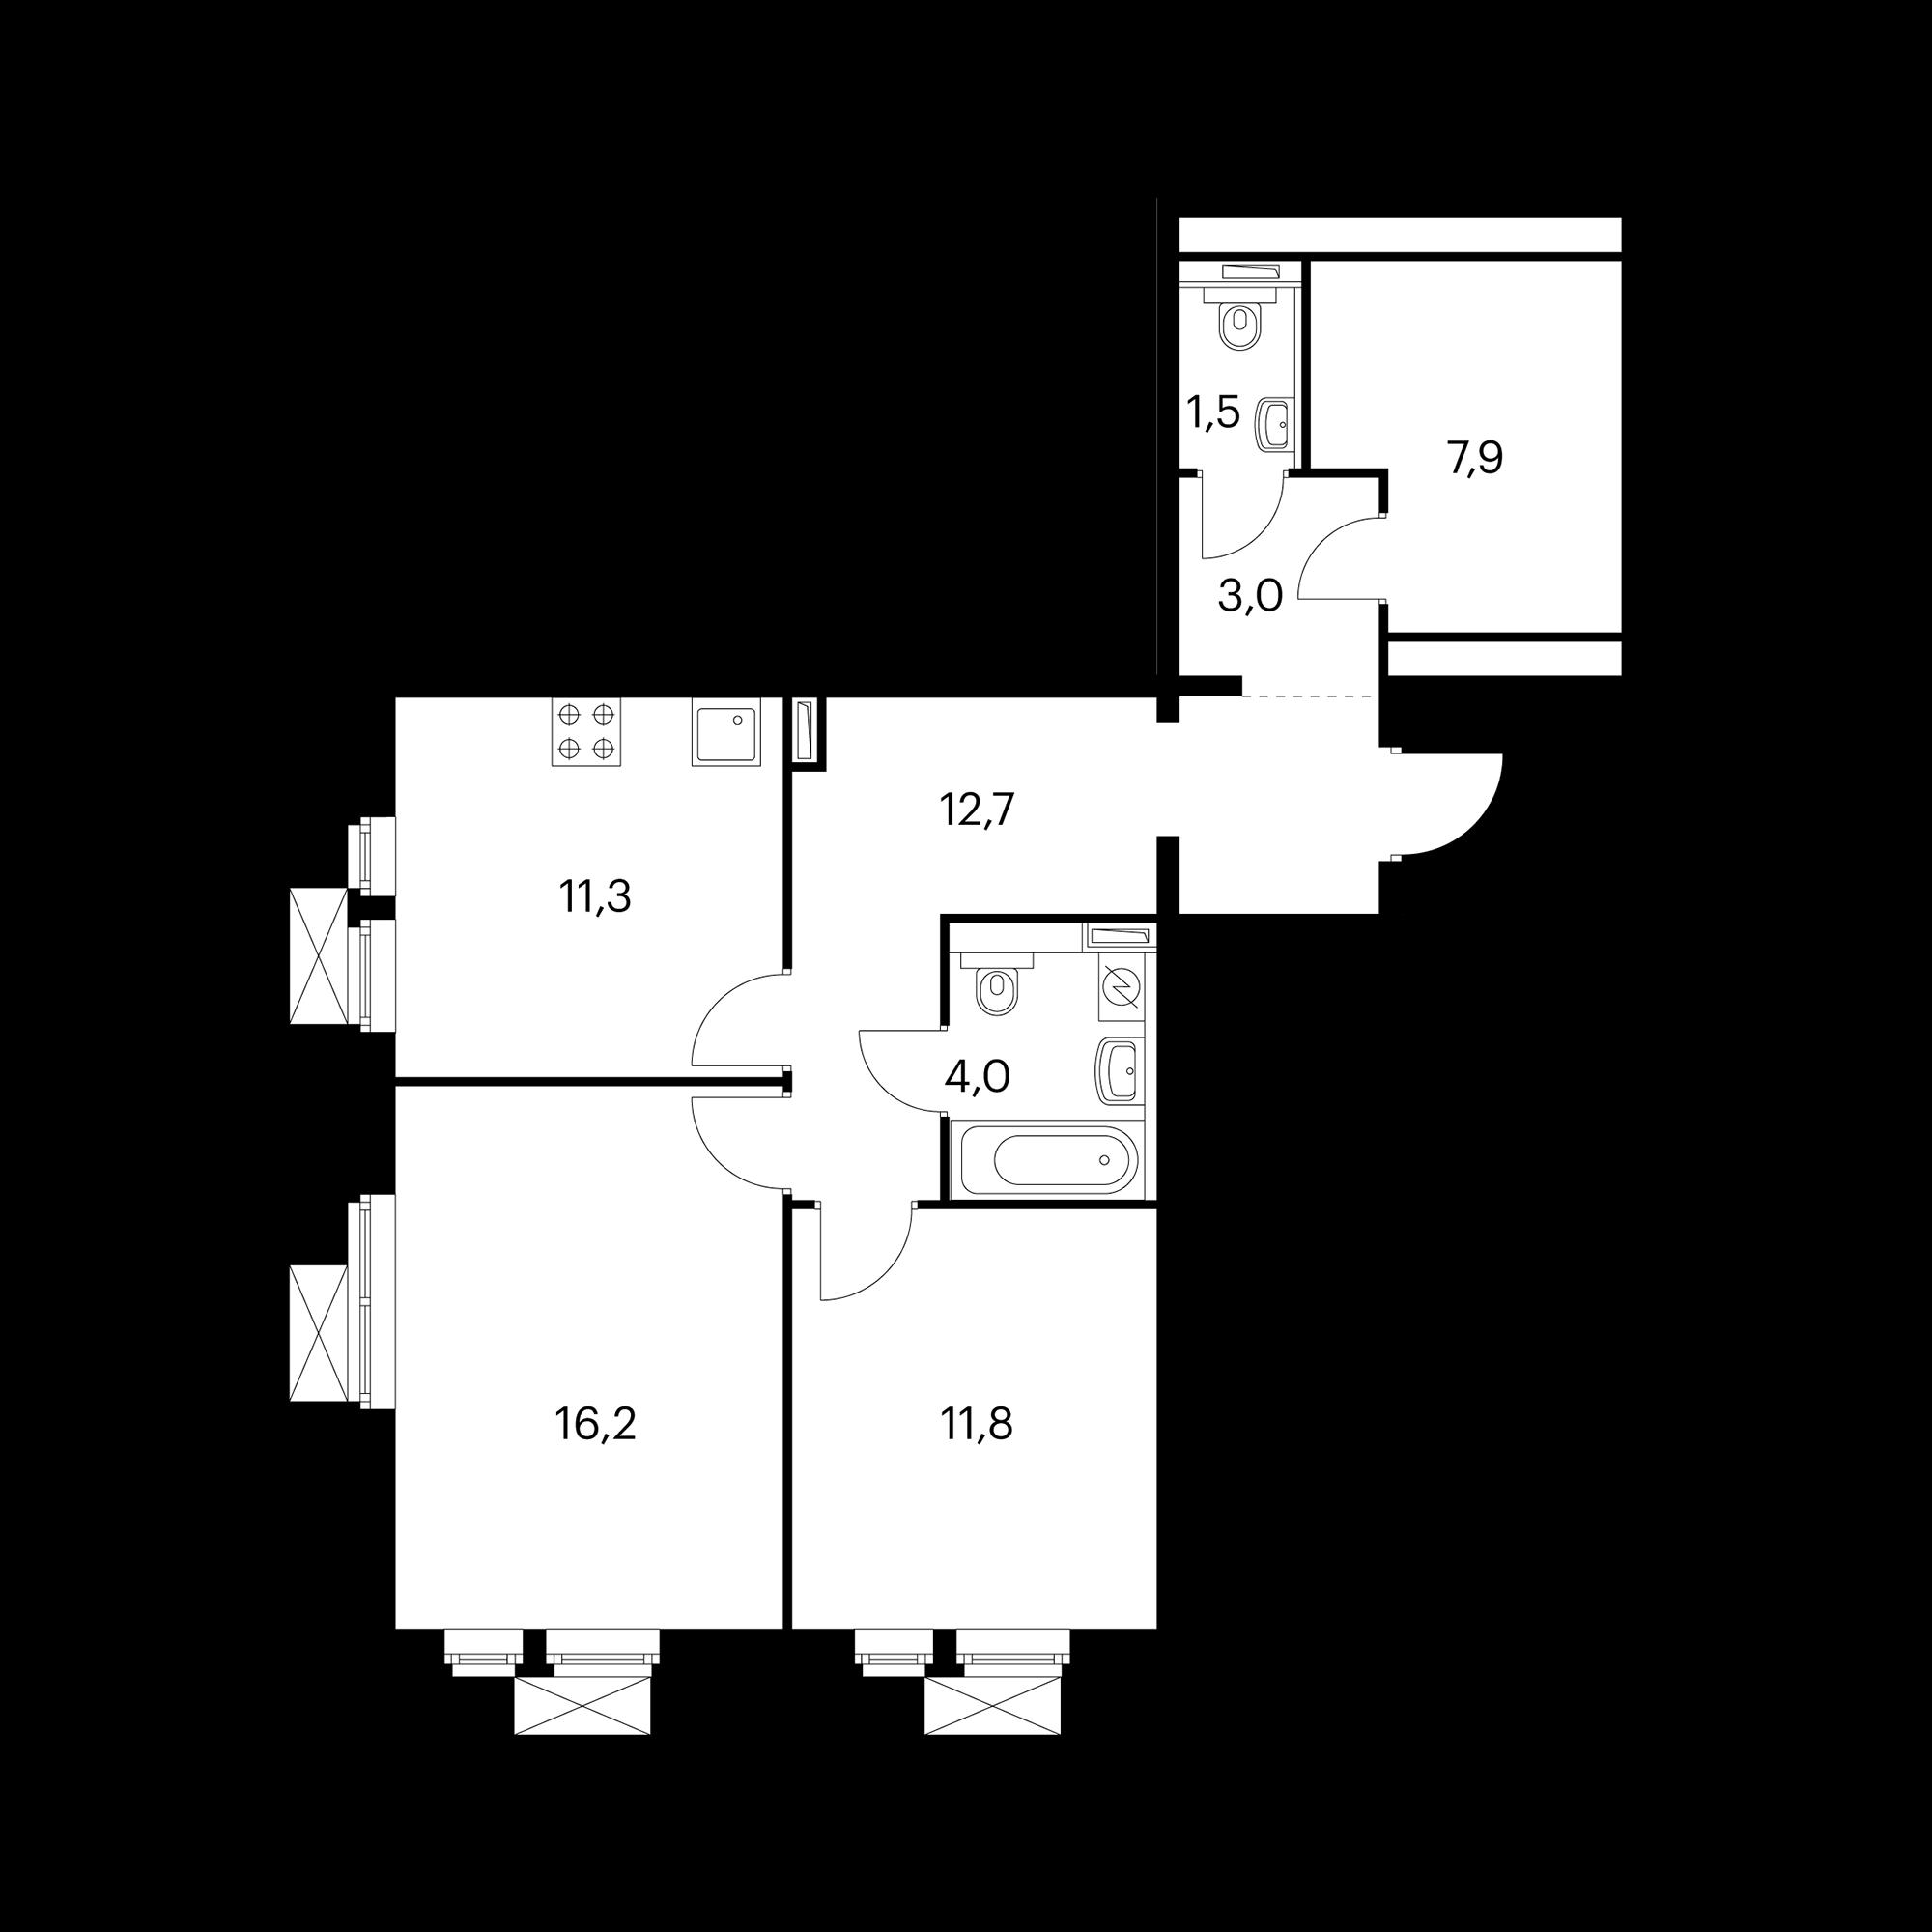 2KL22_6.9-1